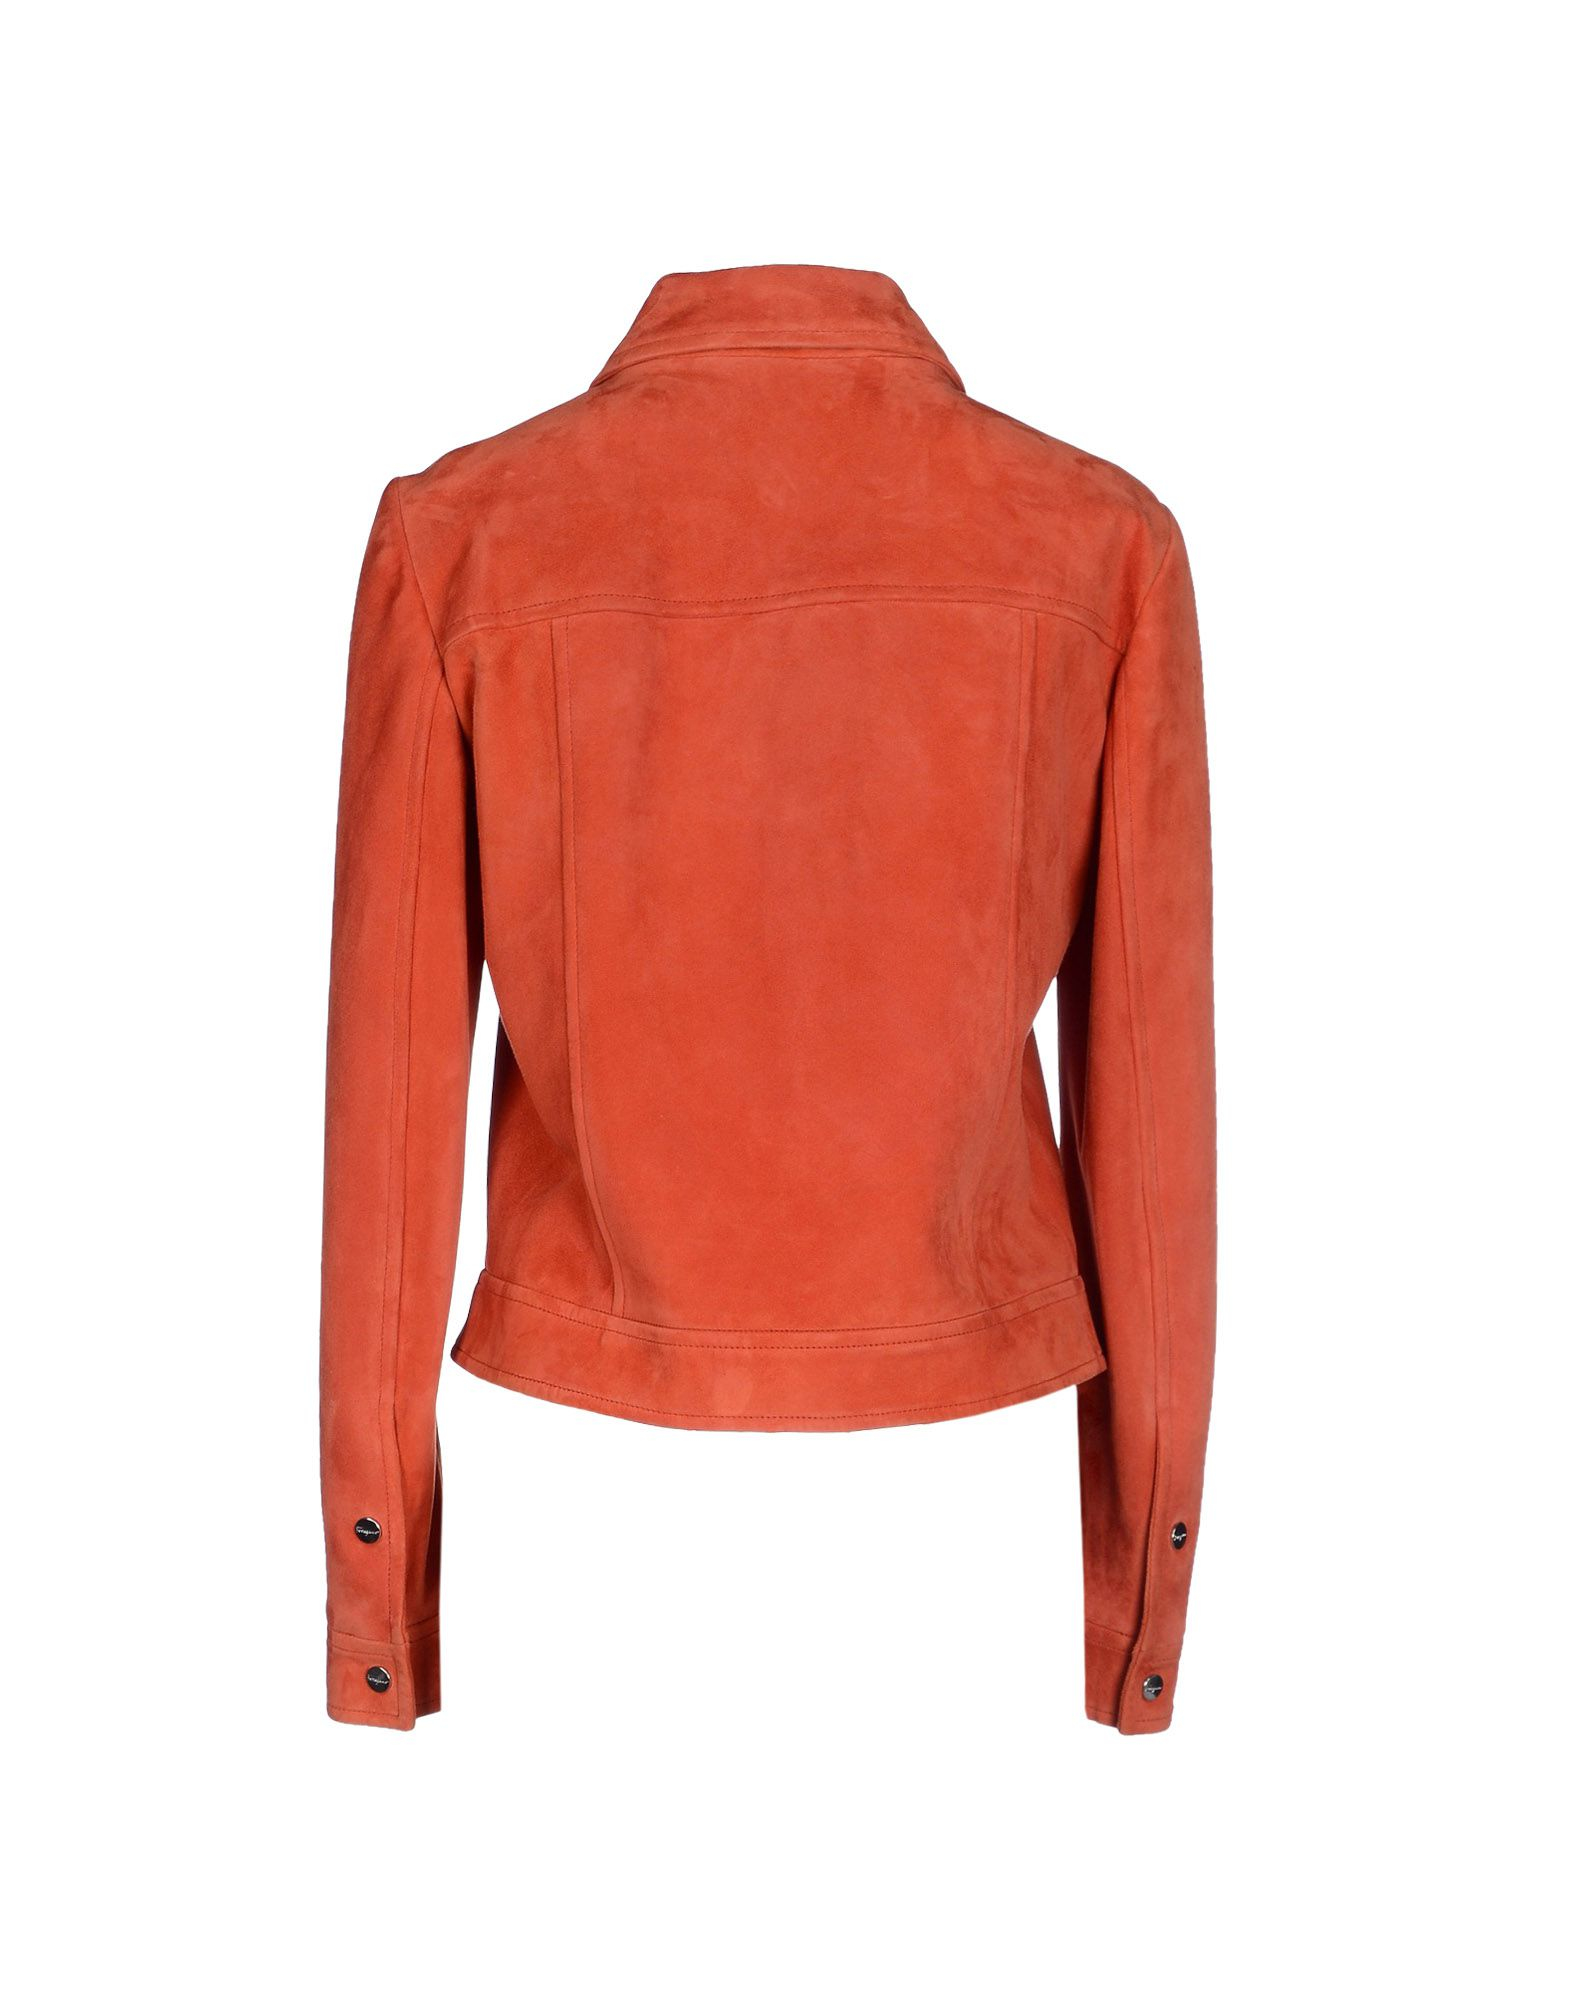 Ferragamo Jacket In Orange Lyst